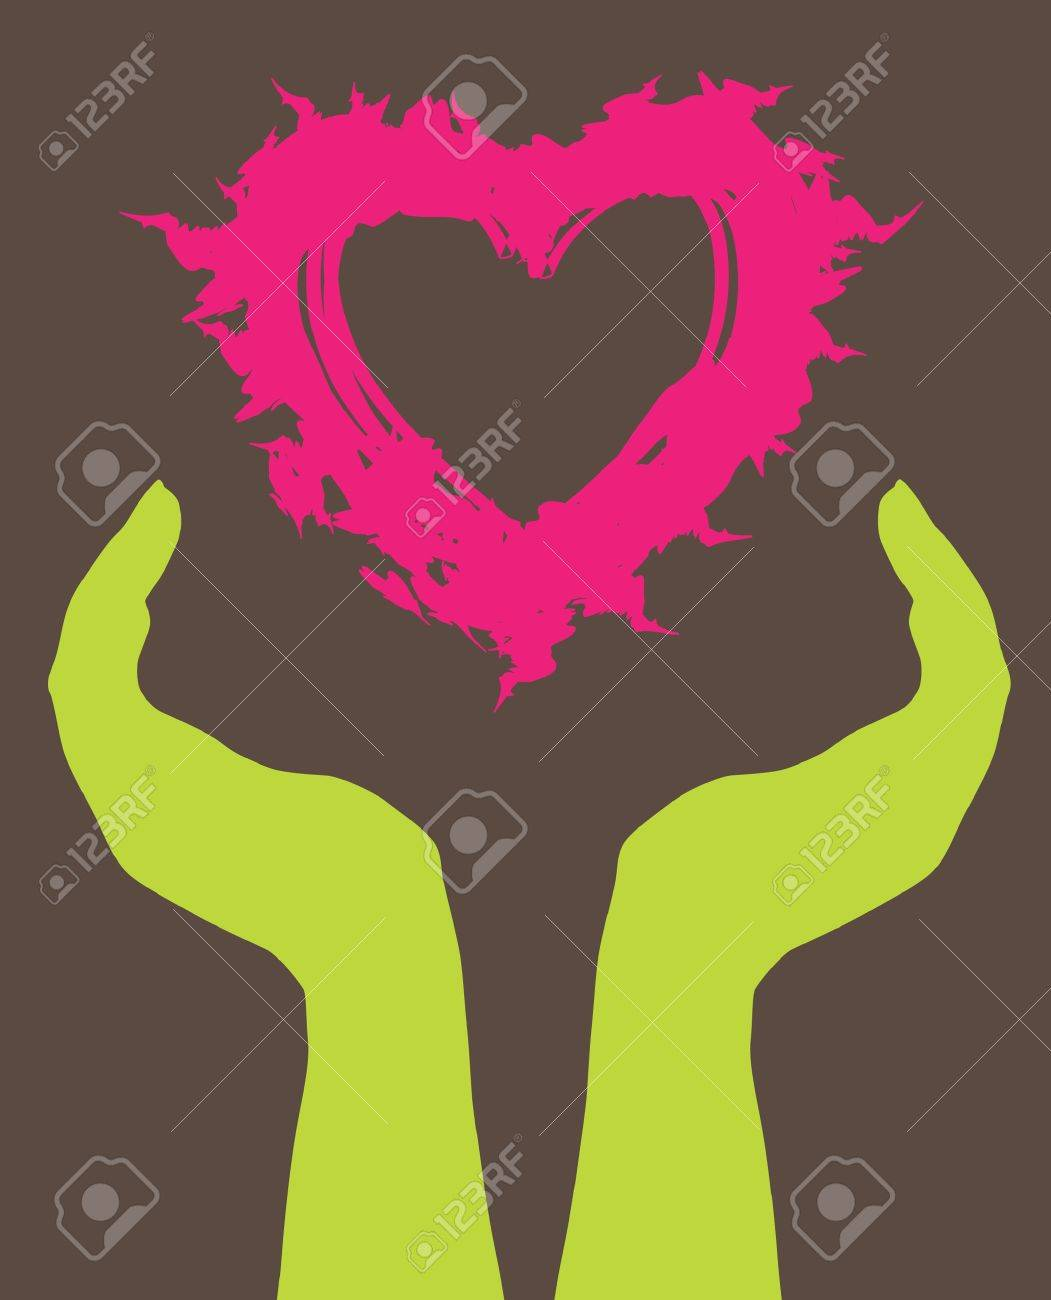 human hands caring heart, symbol of love Stock Vector - 9104771